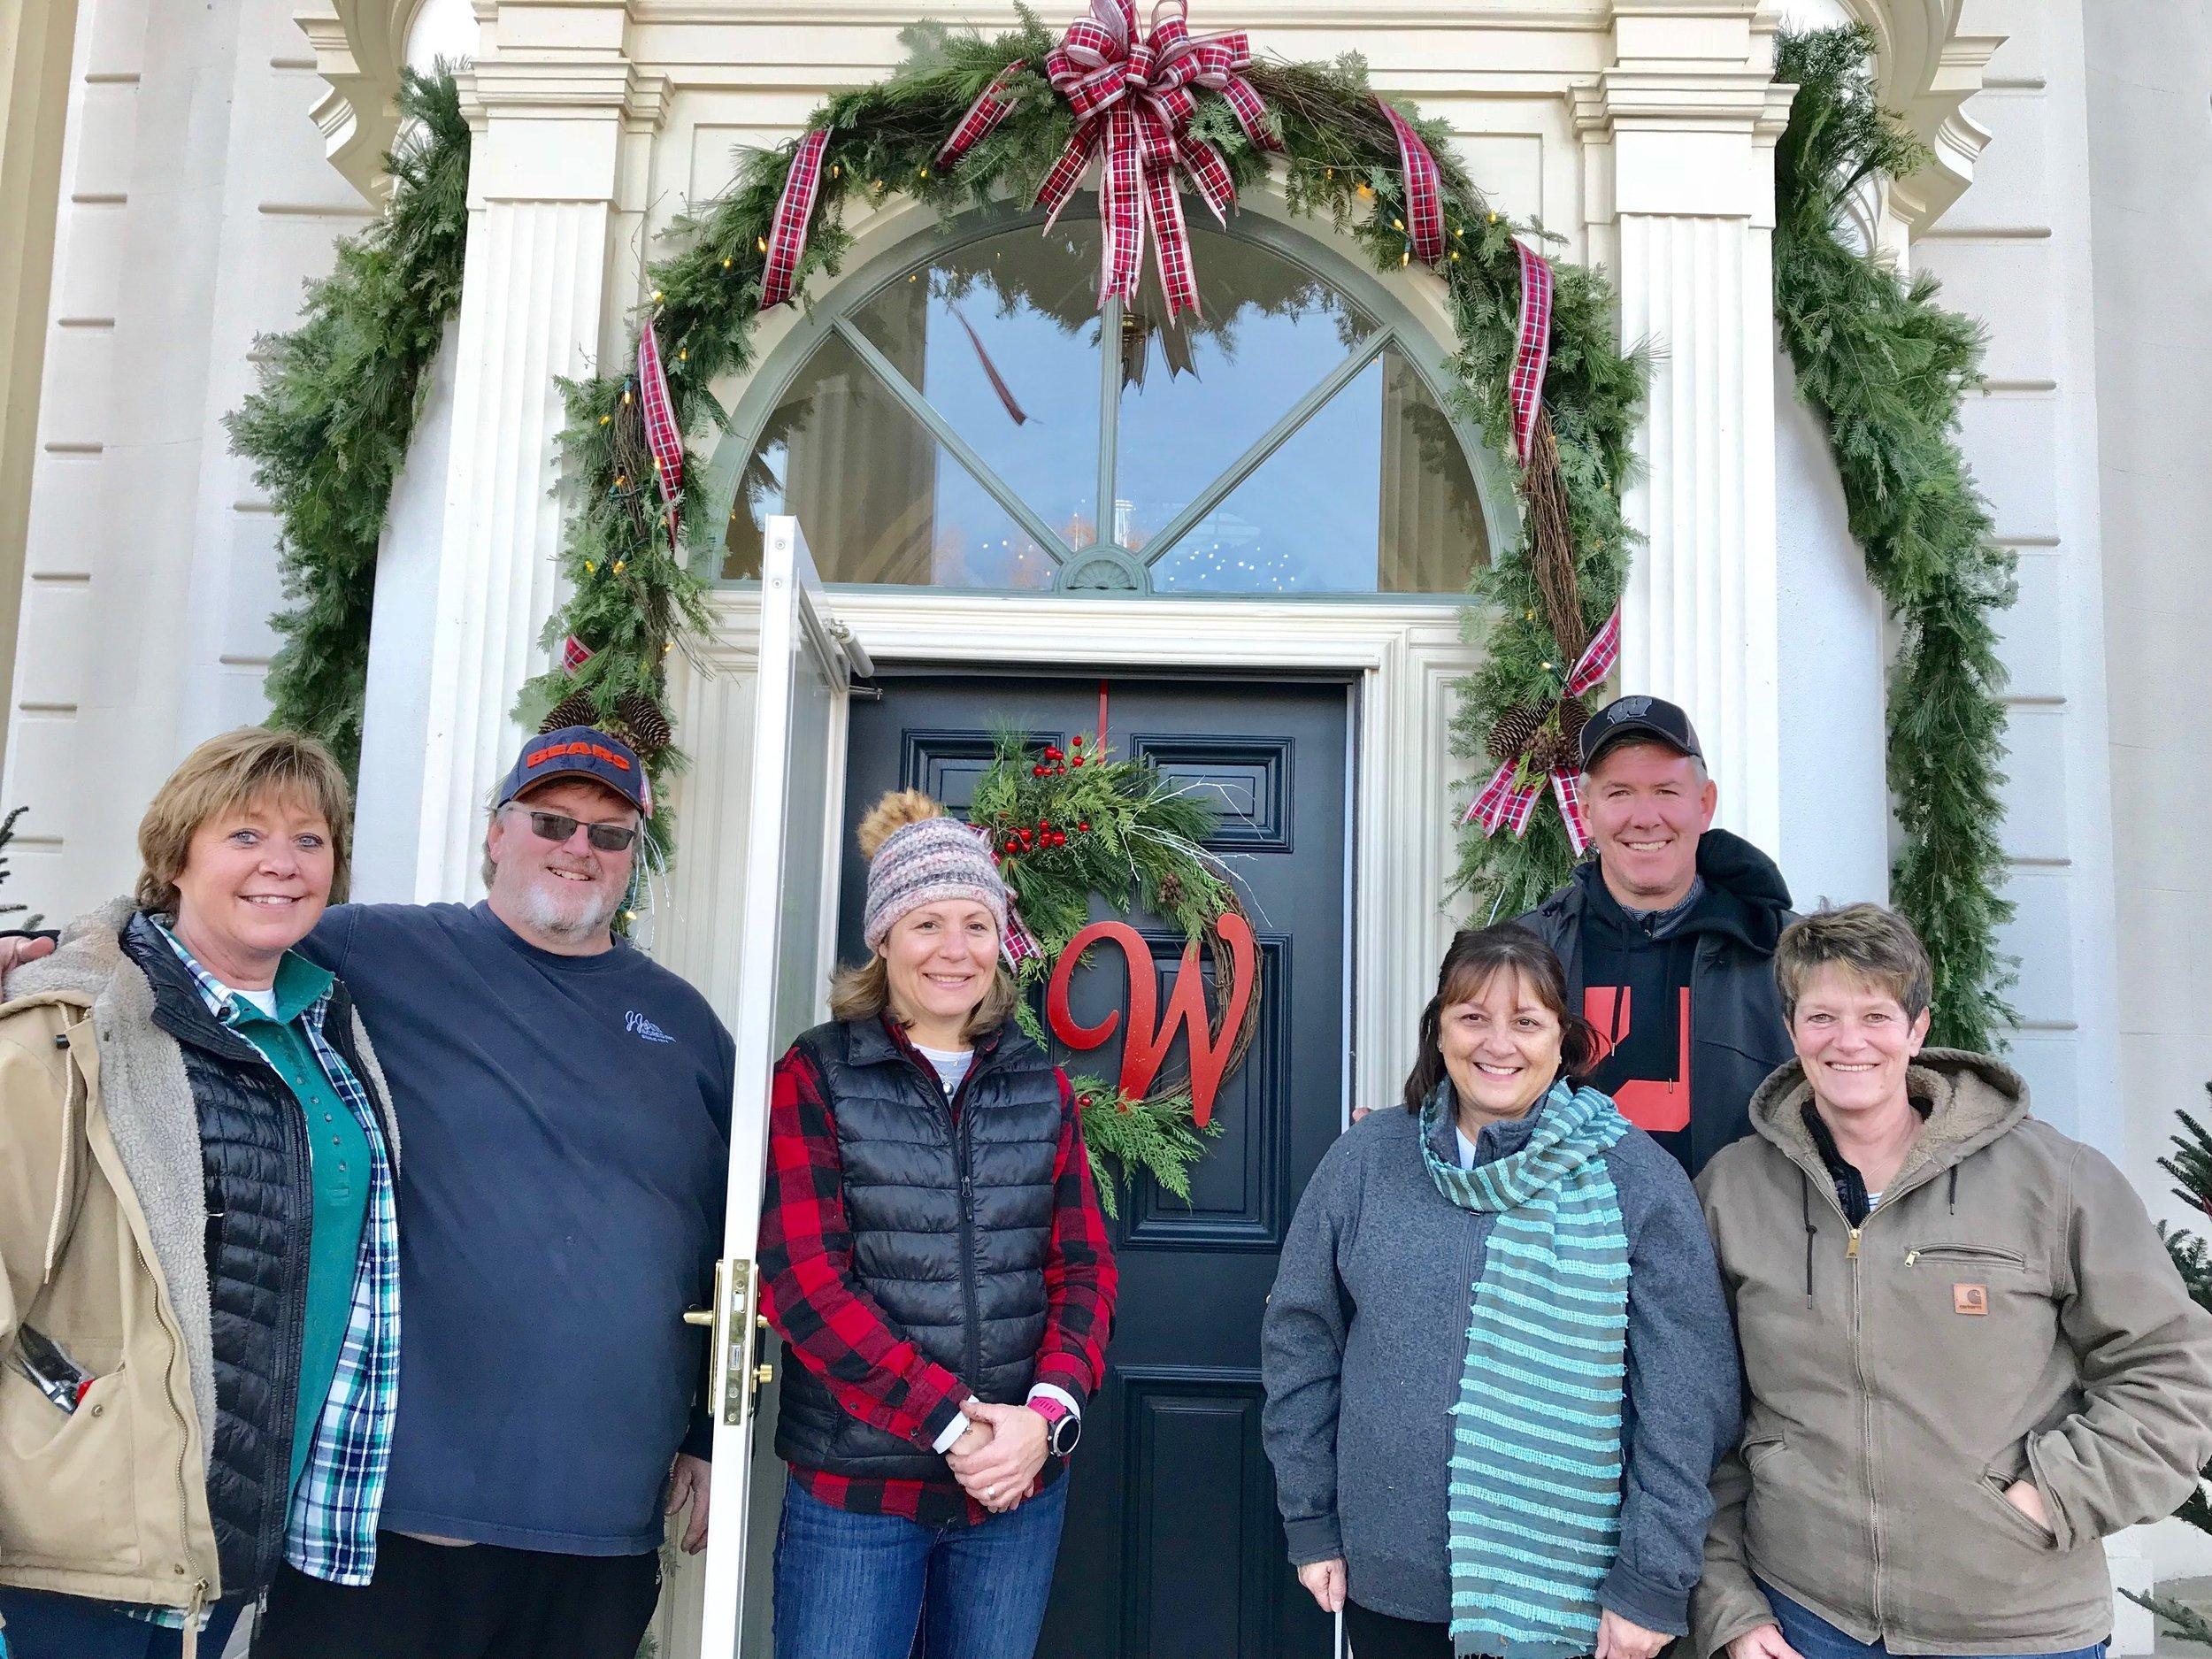 Governors Executive Residence Christmas decorating (2018)